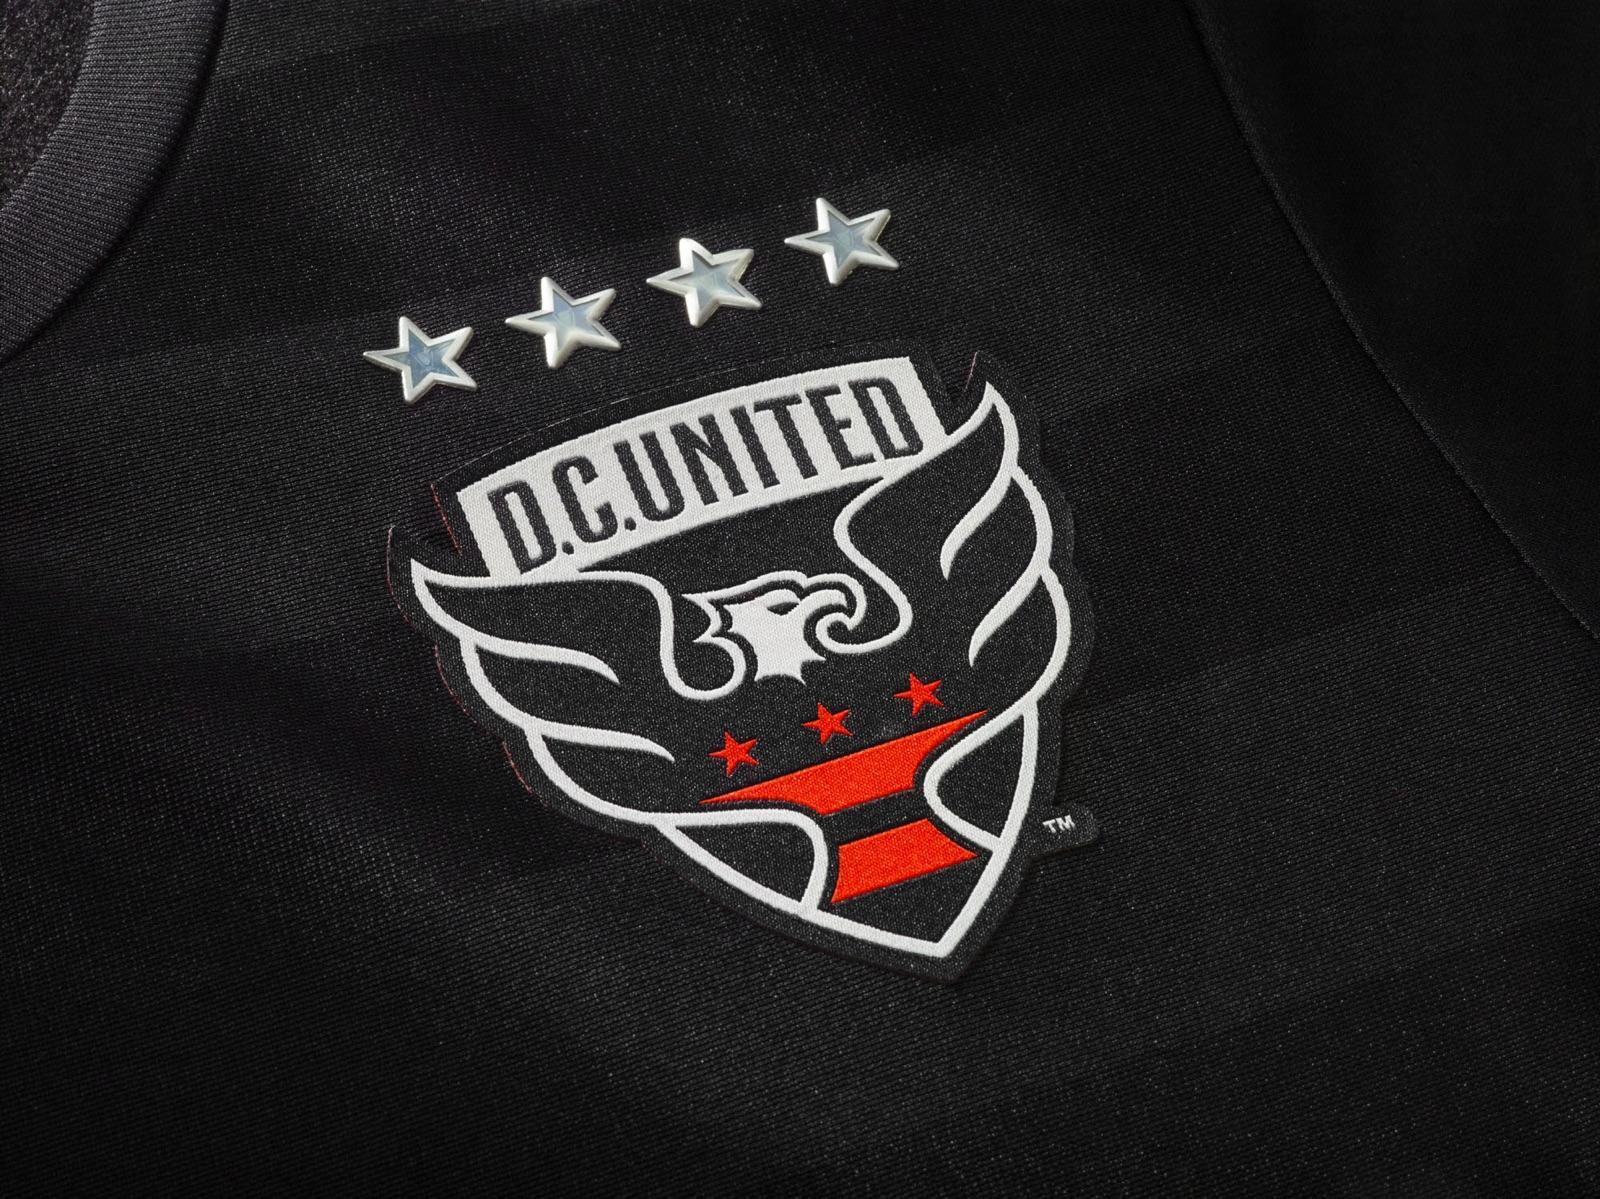 2016 DCU jersey tease